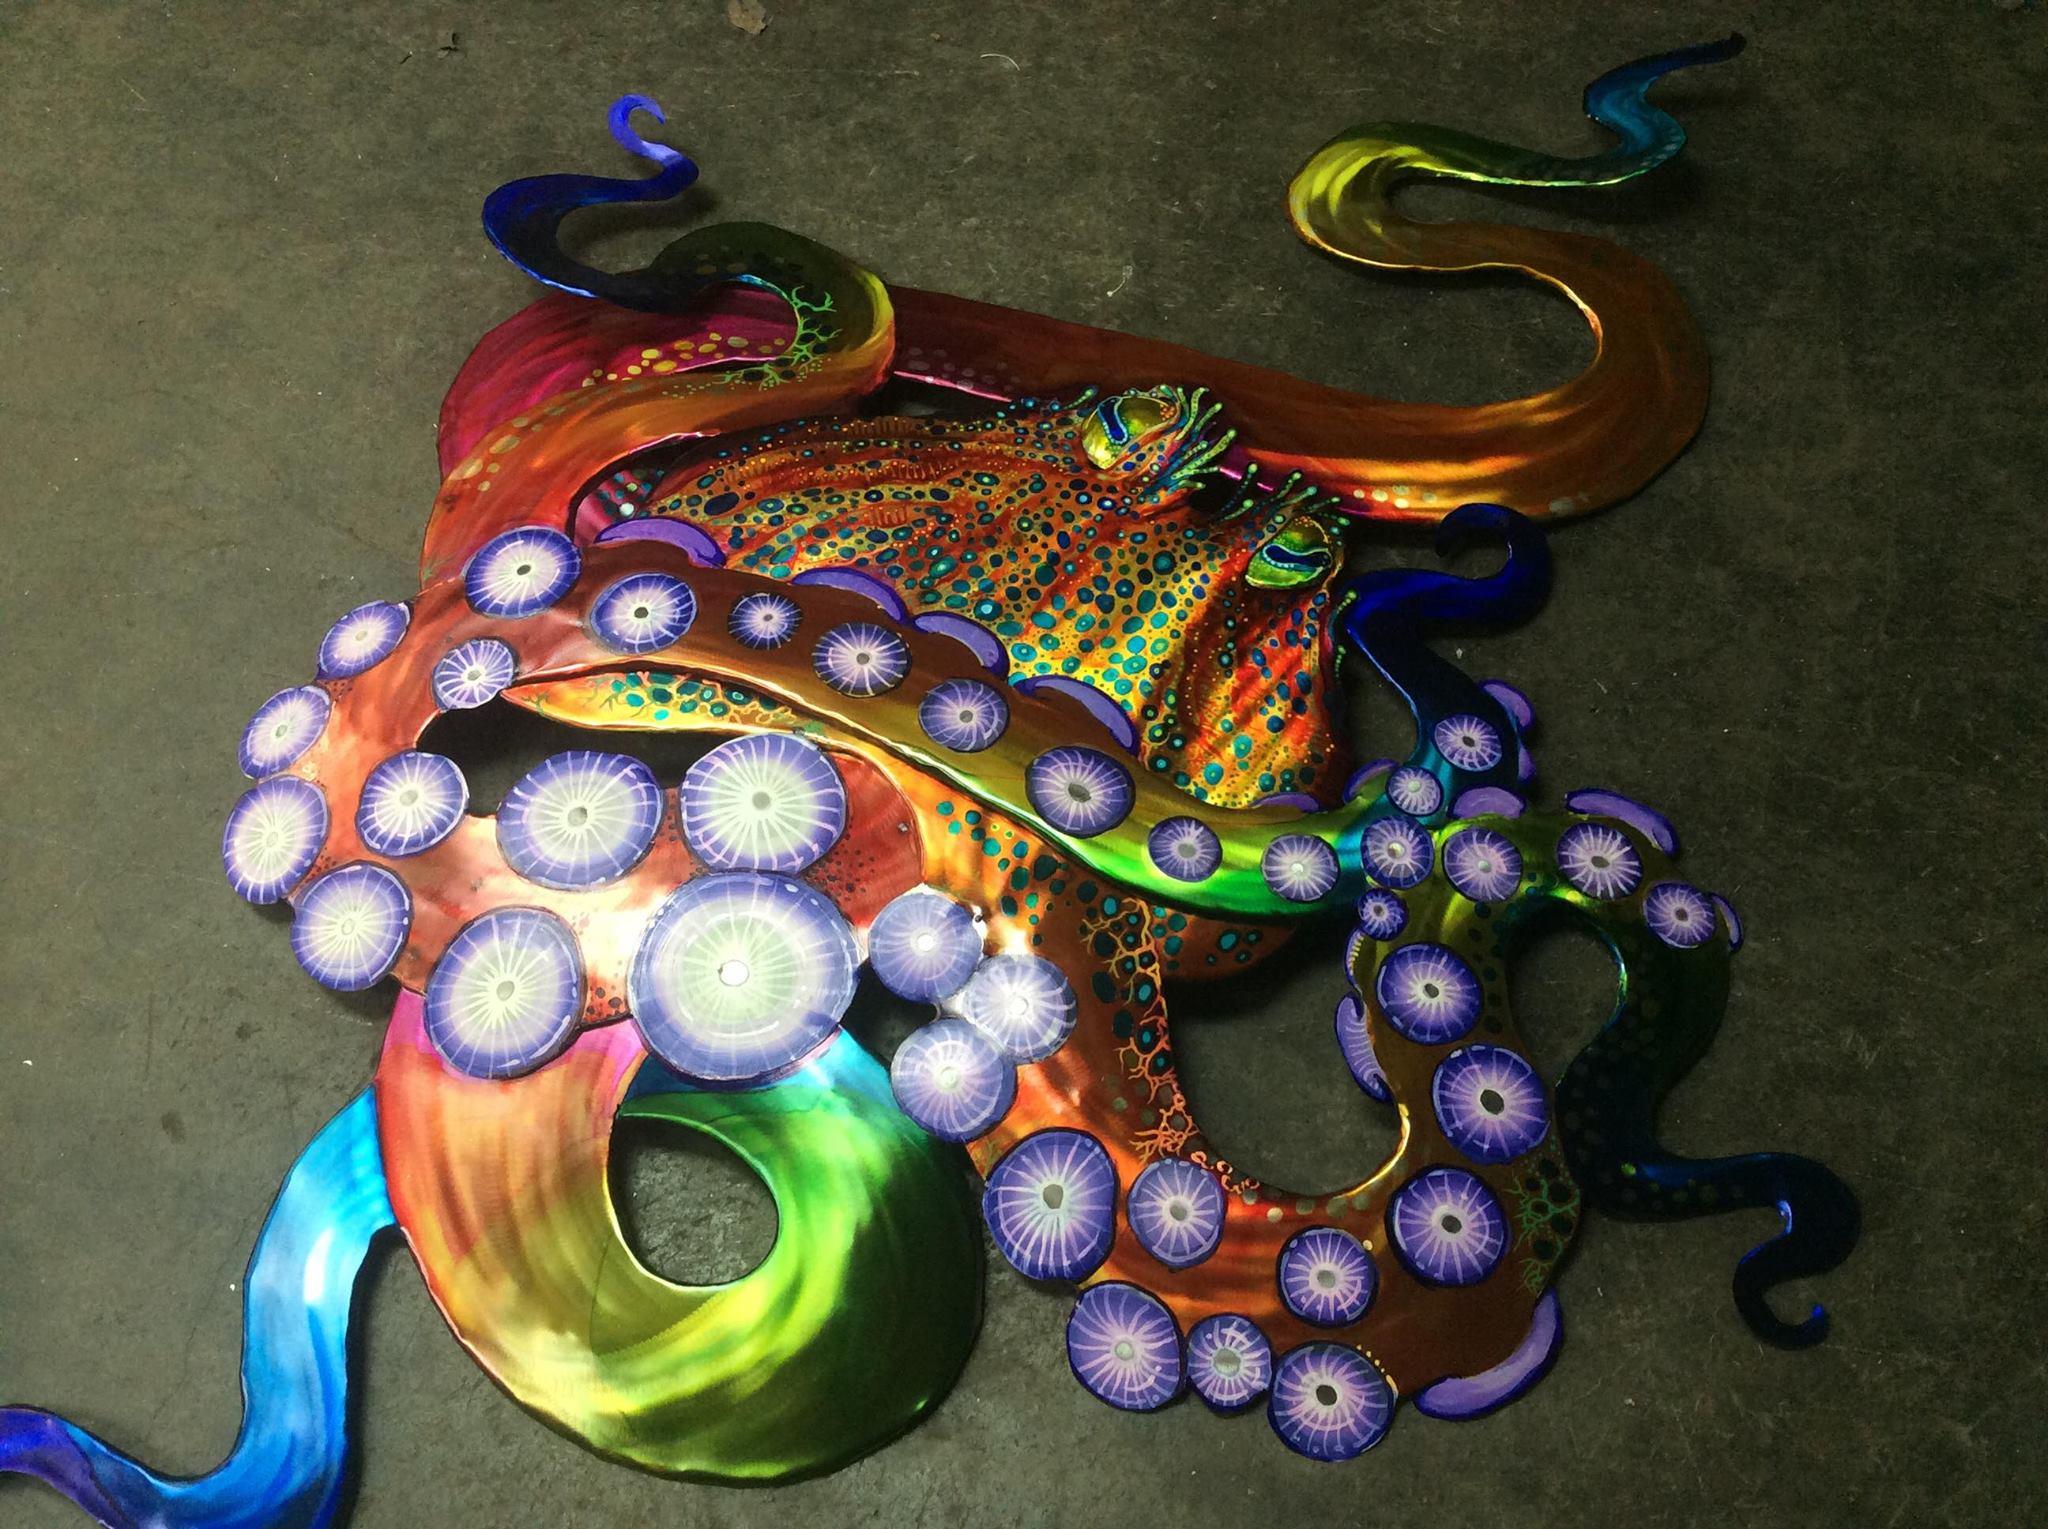 kraken- ursula